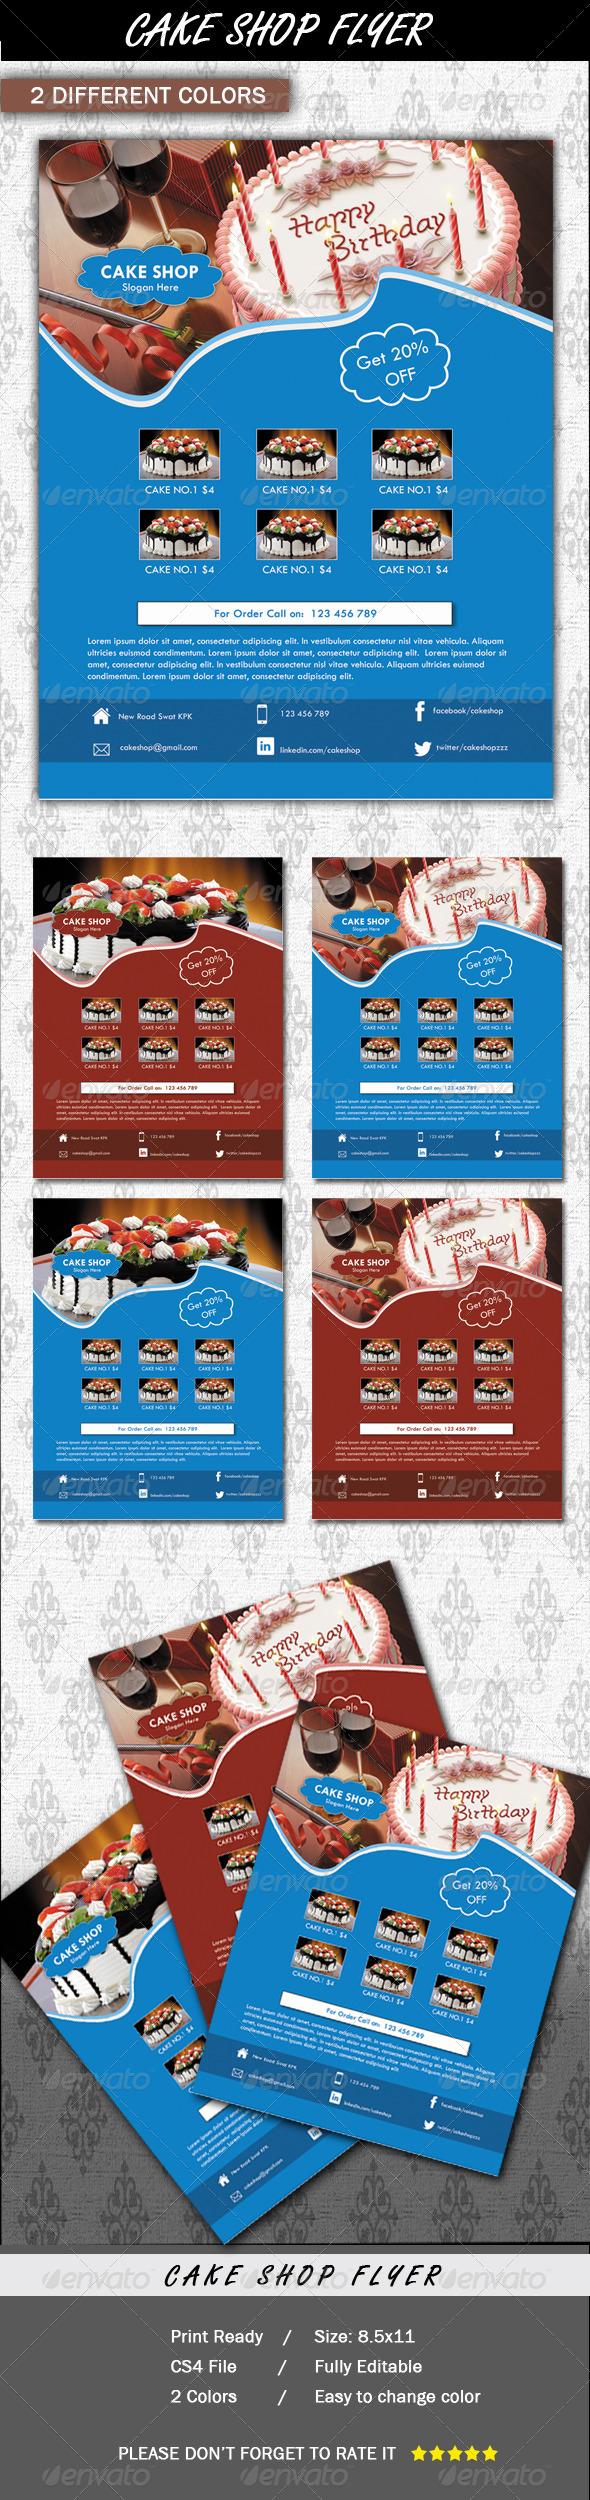 Cake Shop Flyer - Print Templates